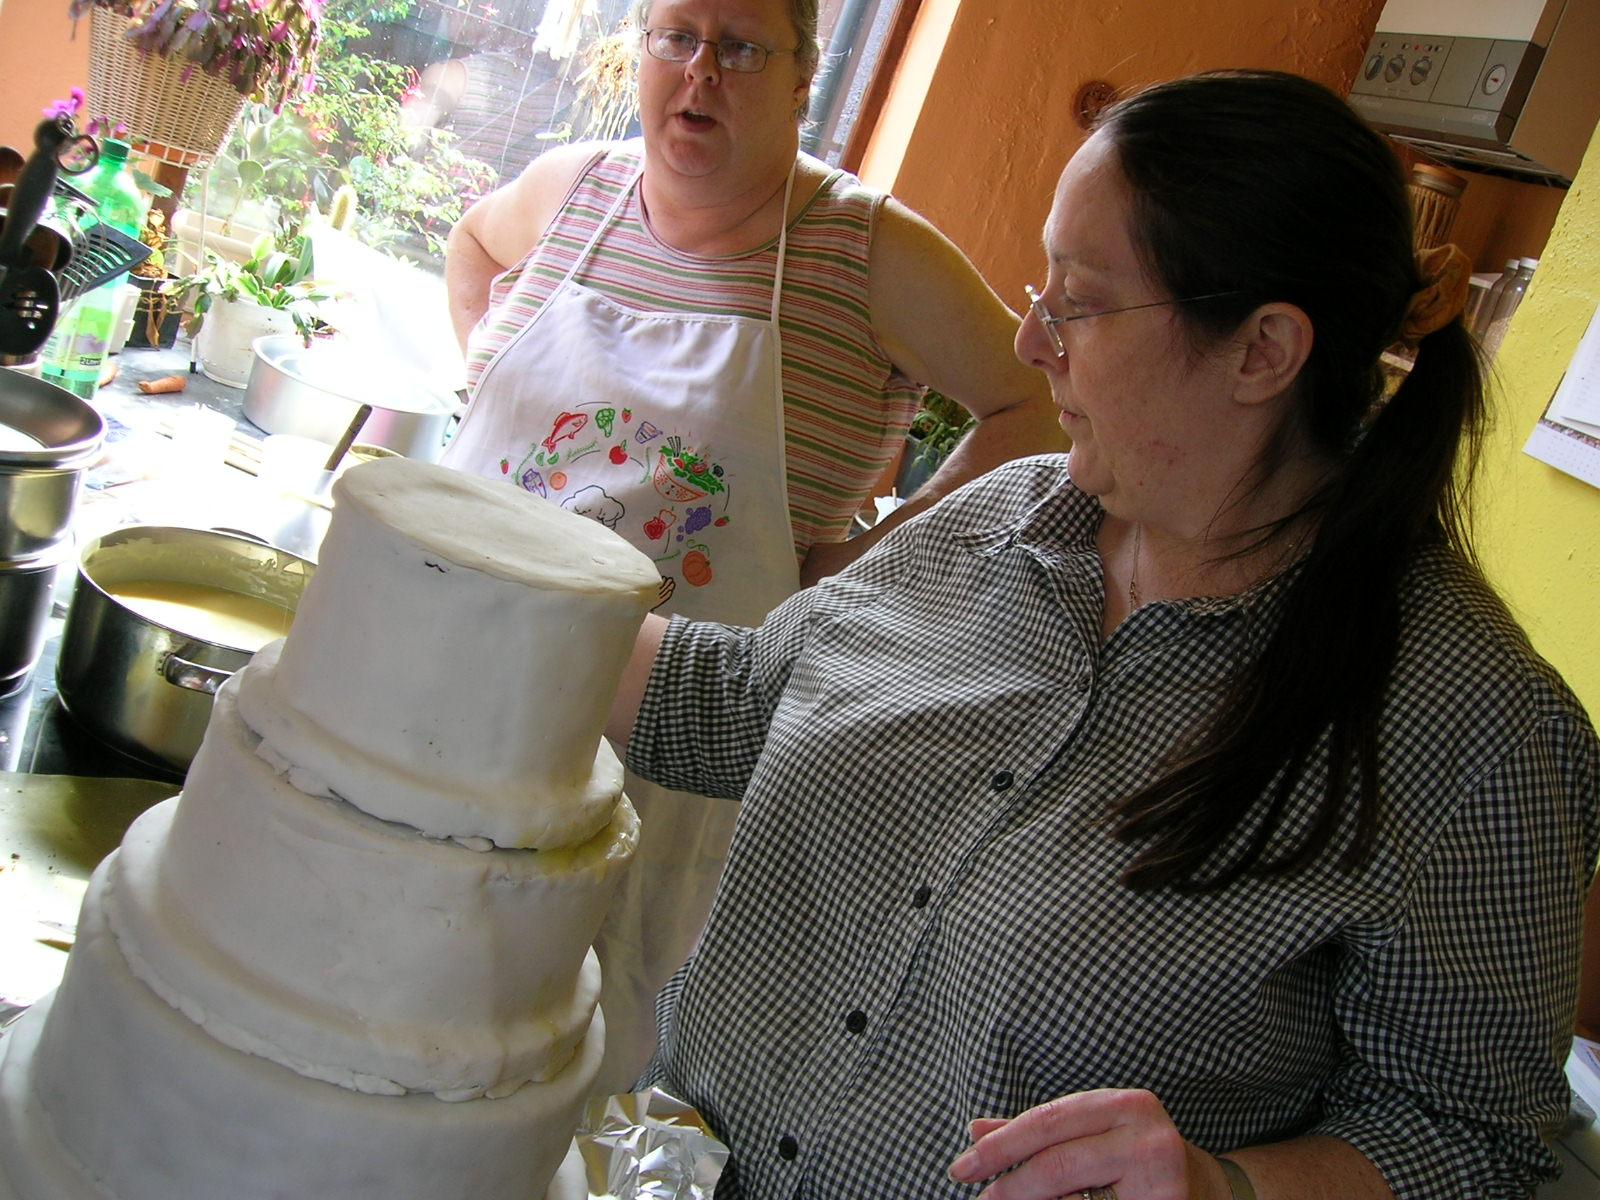 The cake takes shape